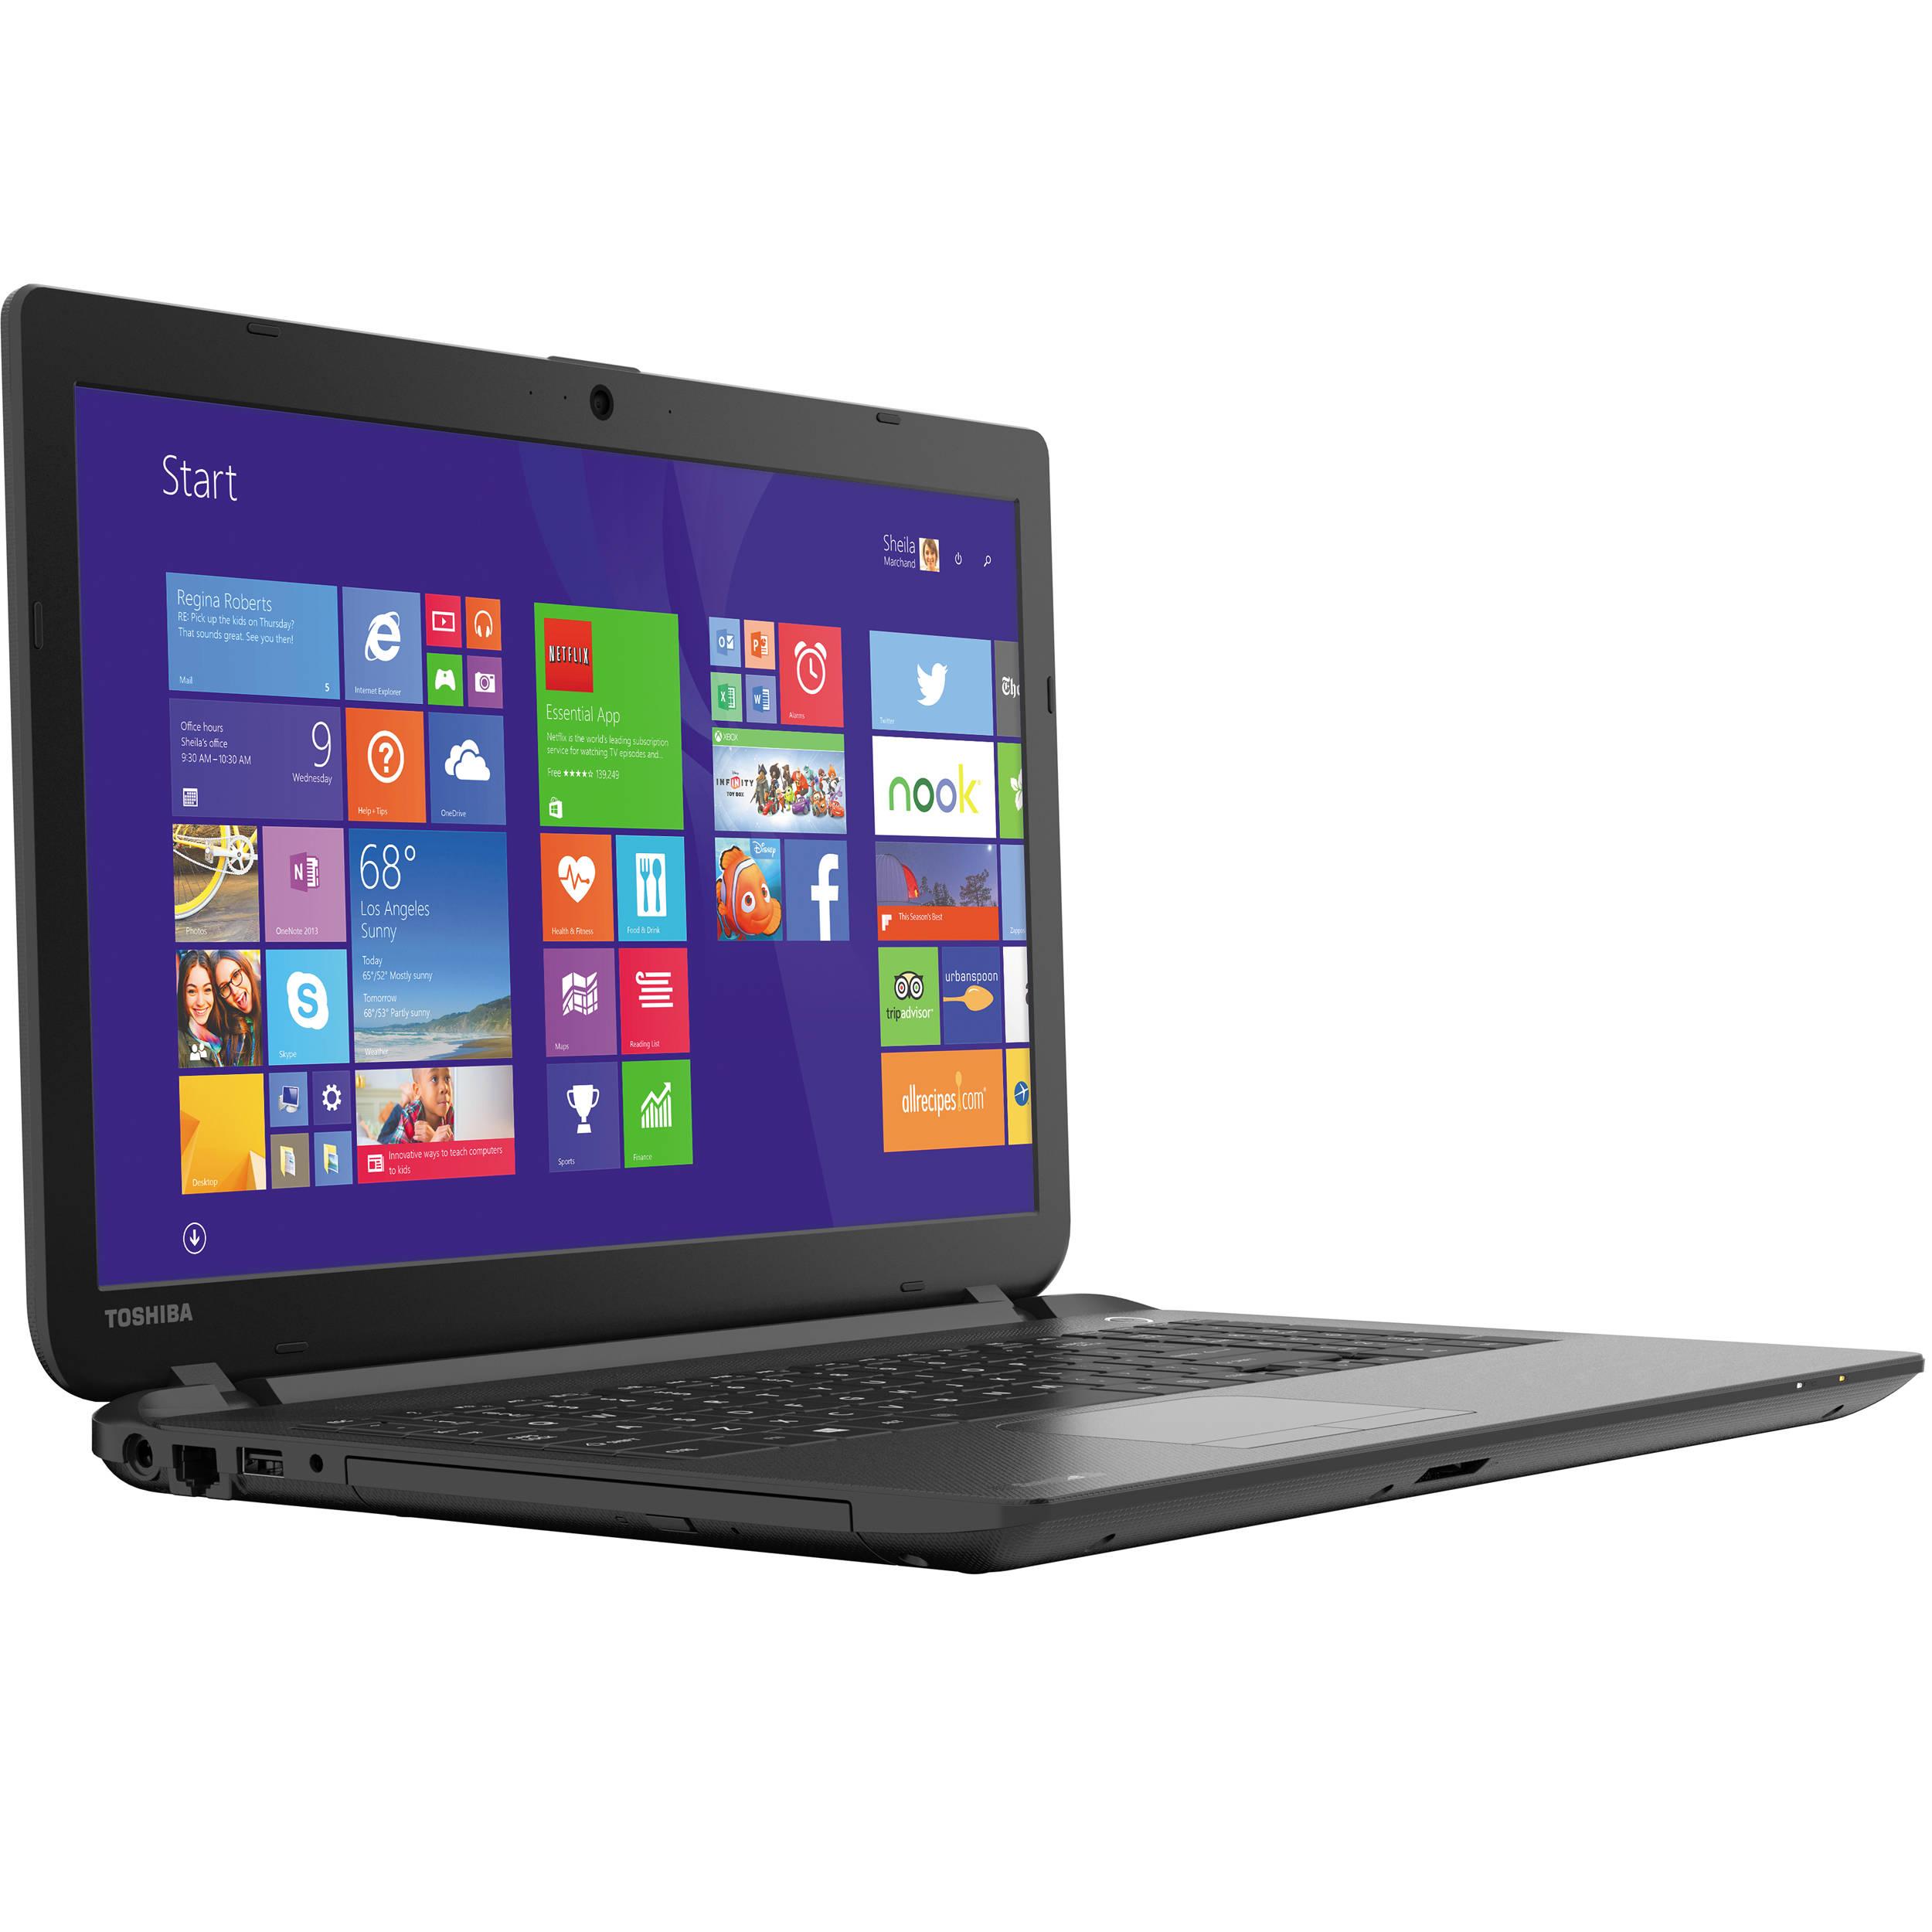 "Toshiba 15.6"" Satellite C55 Series Notebook with Windows 8.1 with Bing (Jet  Black)"